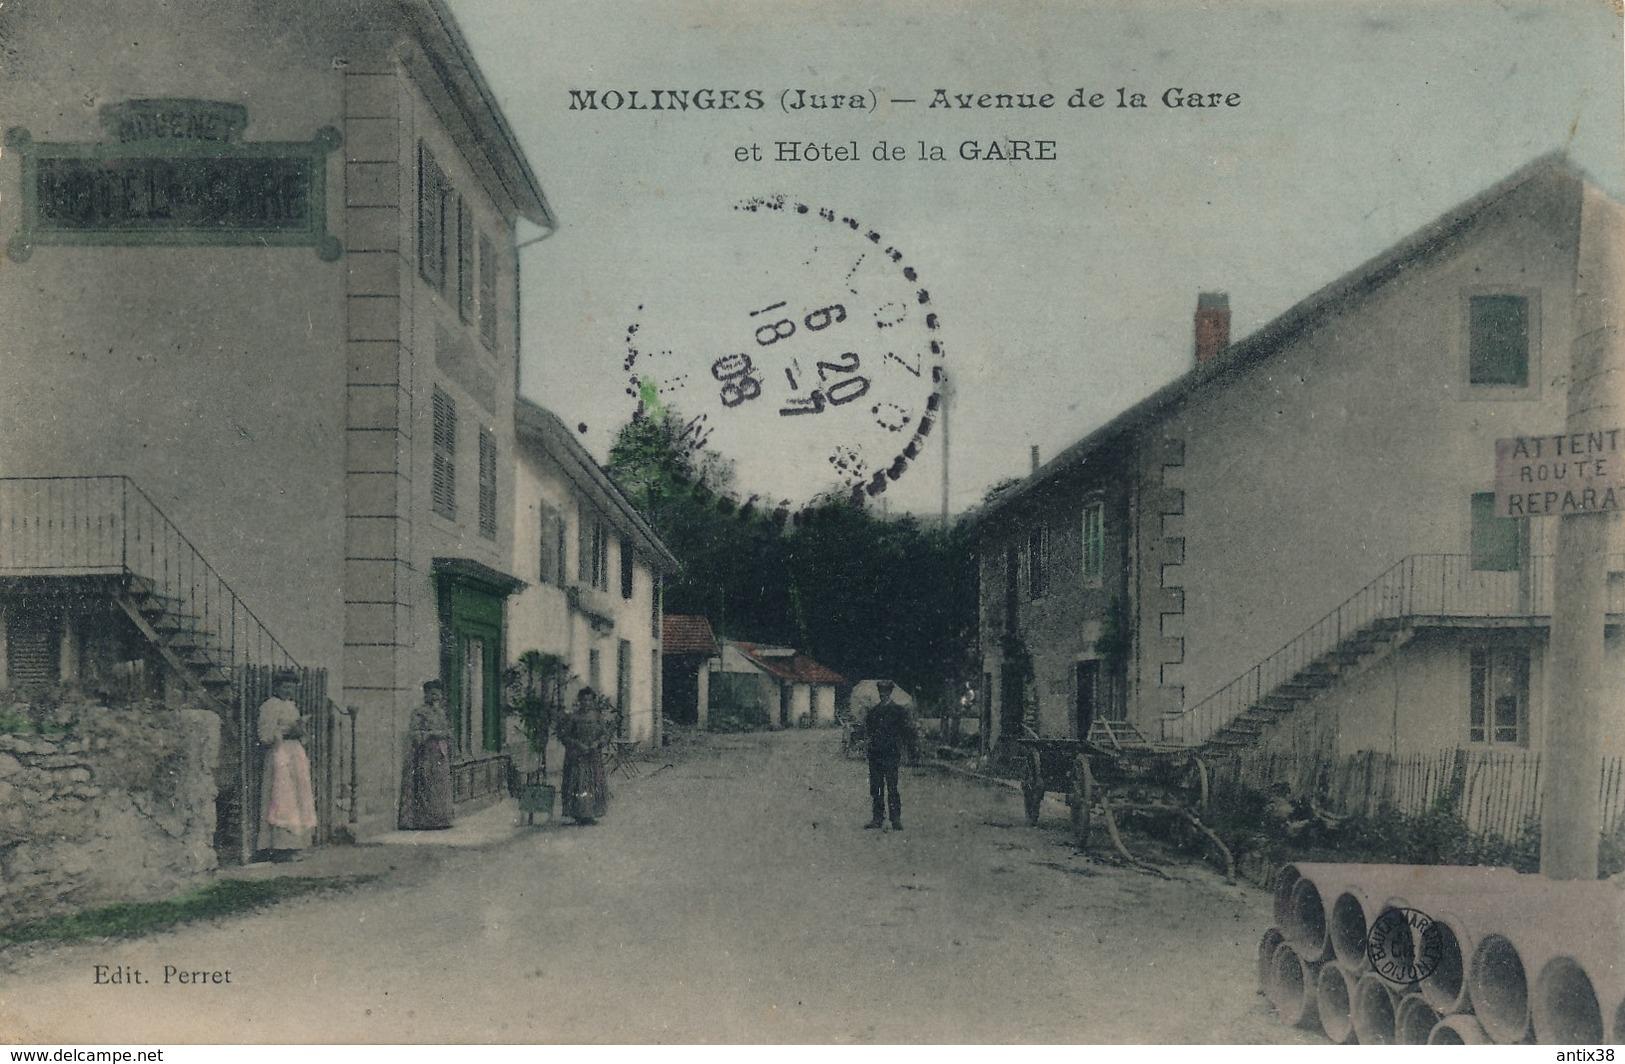 I23 - 39 - MOLINGES - Jura - Avenue De La Gare Et Hôtel De La Gare - France